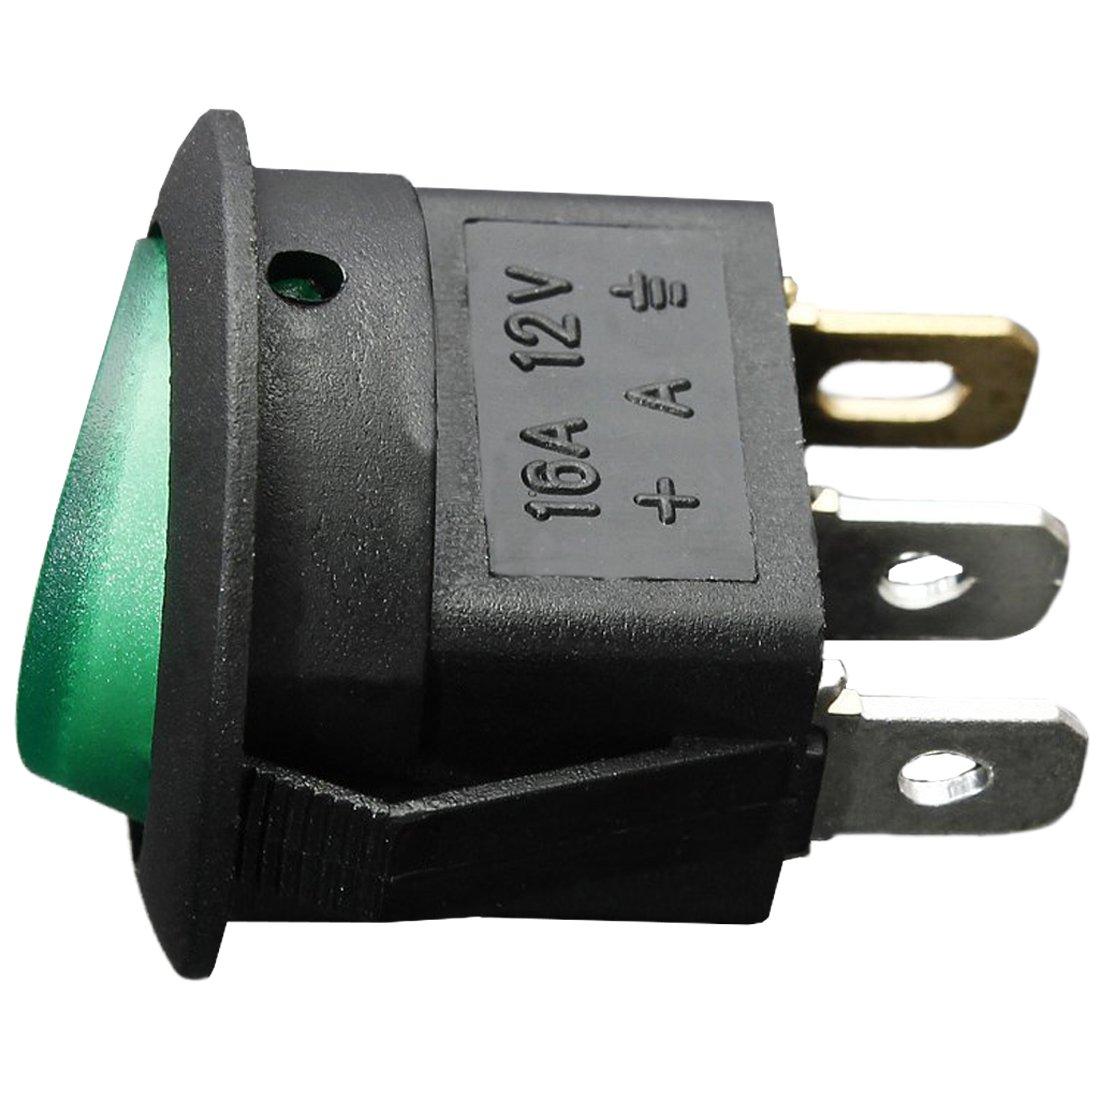 Cikuso 12V 16A LED Interruptor basculante Bipolar ON//Off SPST para Auto Moto Barco Azul